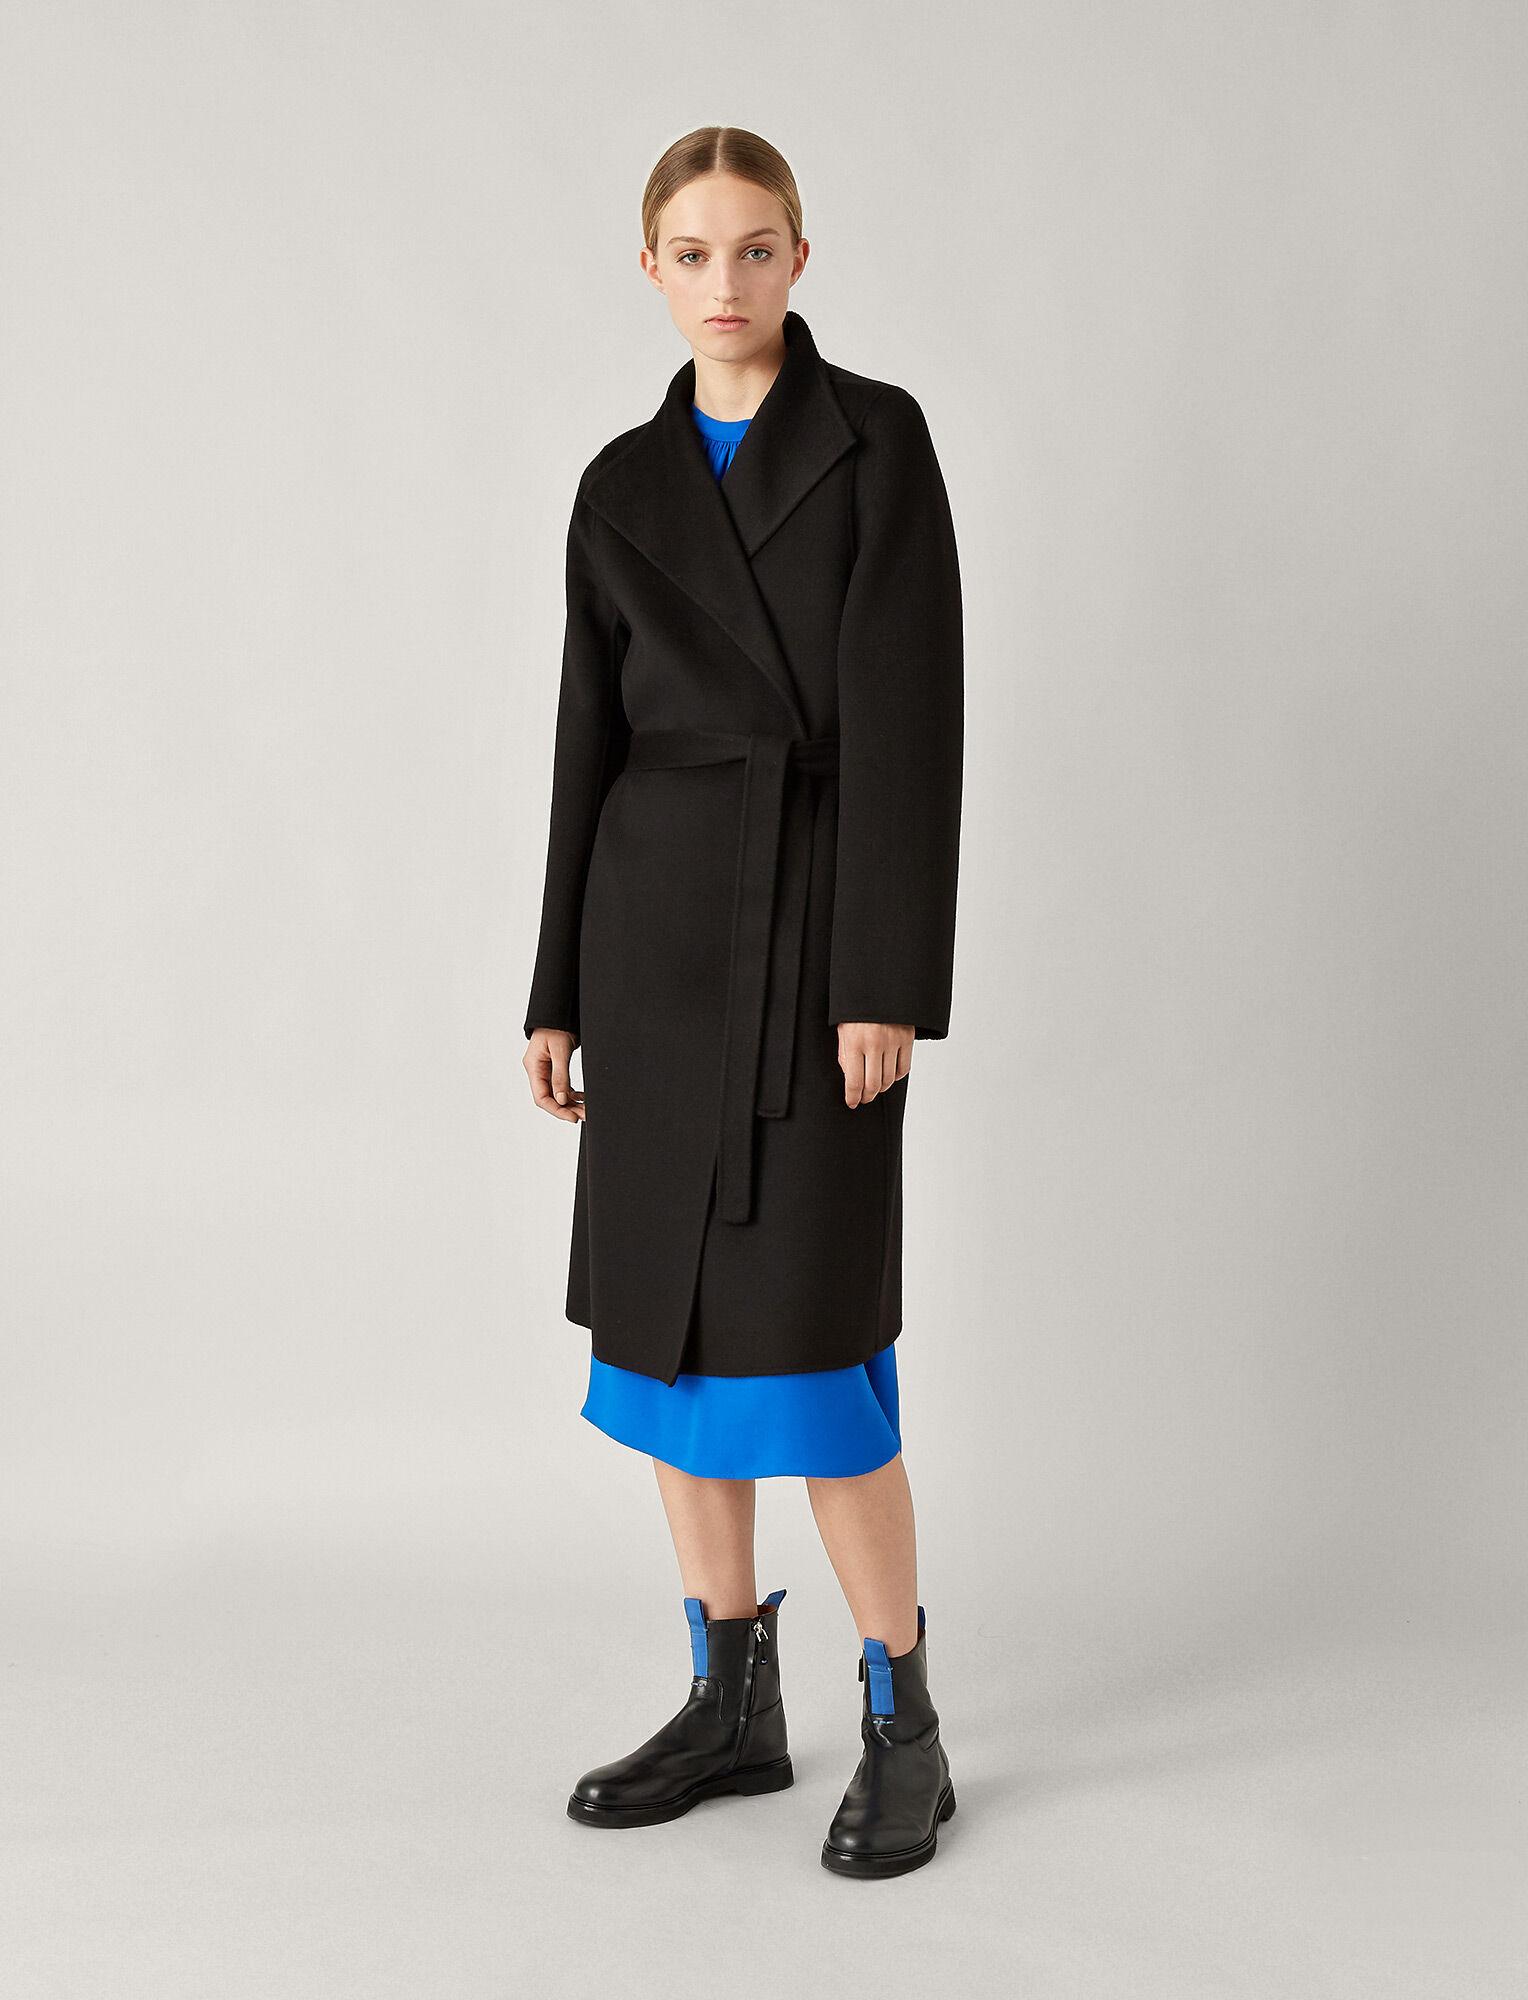 Joseph, Lima Double Face Cashmere Coat, in BLACK